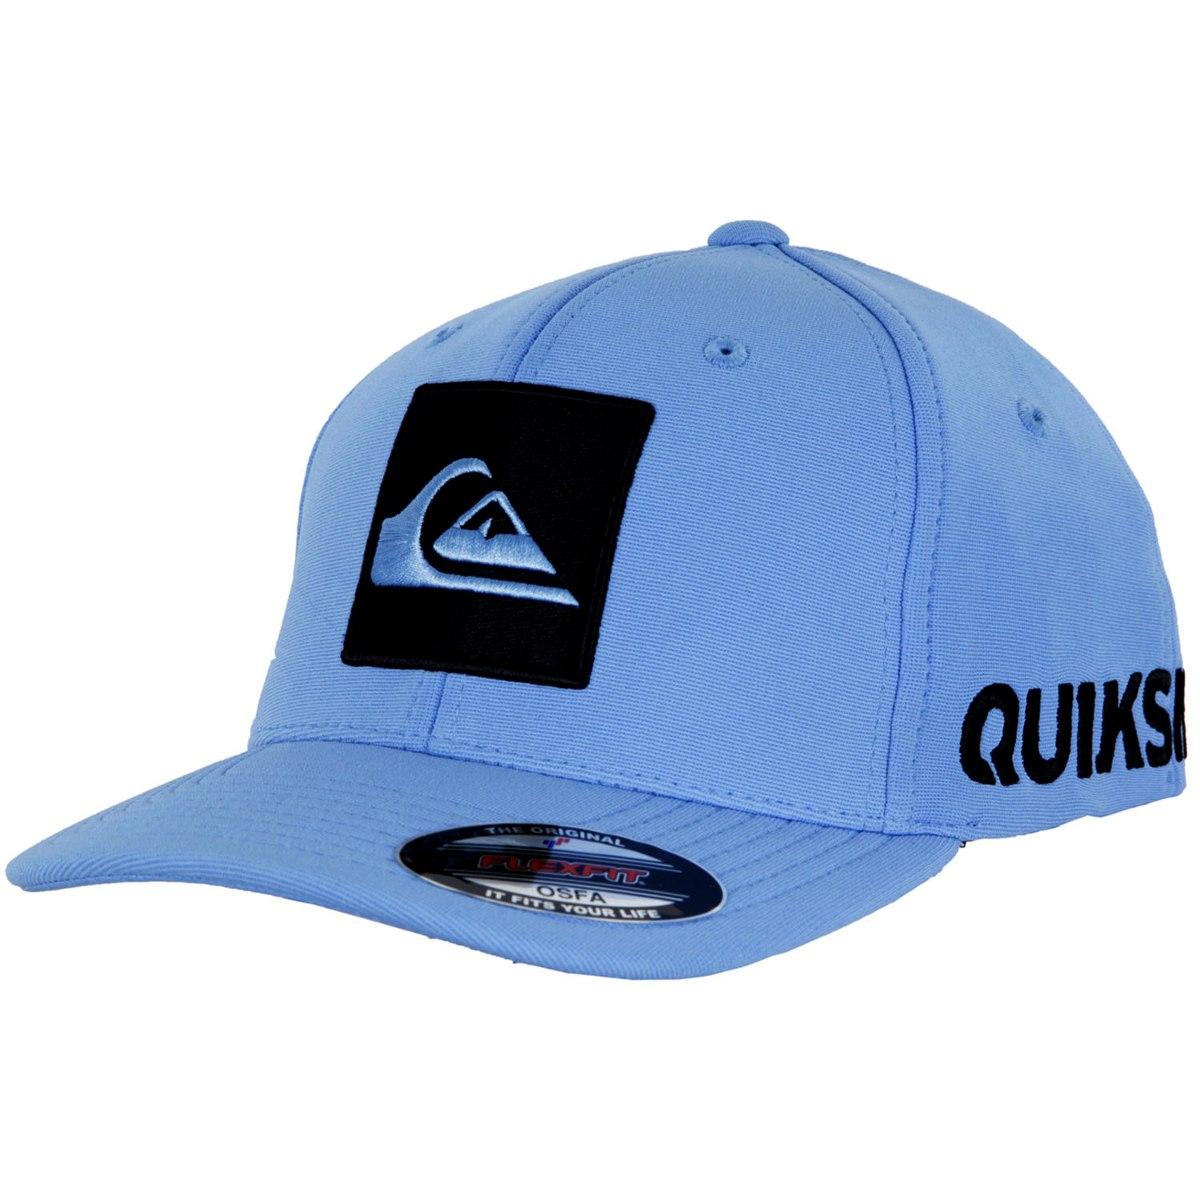 Boné Quiksilver Hard Hitter - Azul - R  252,00 em Mercado Livre 923851efff